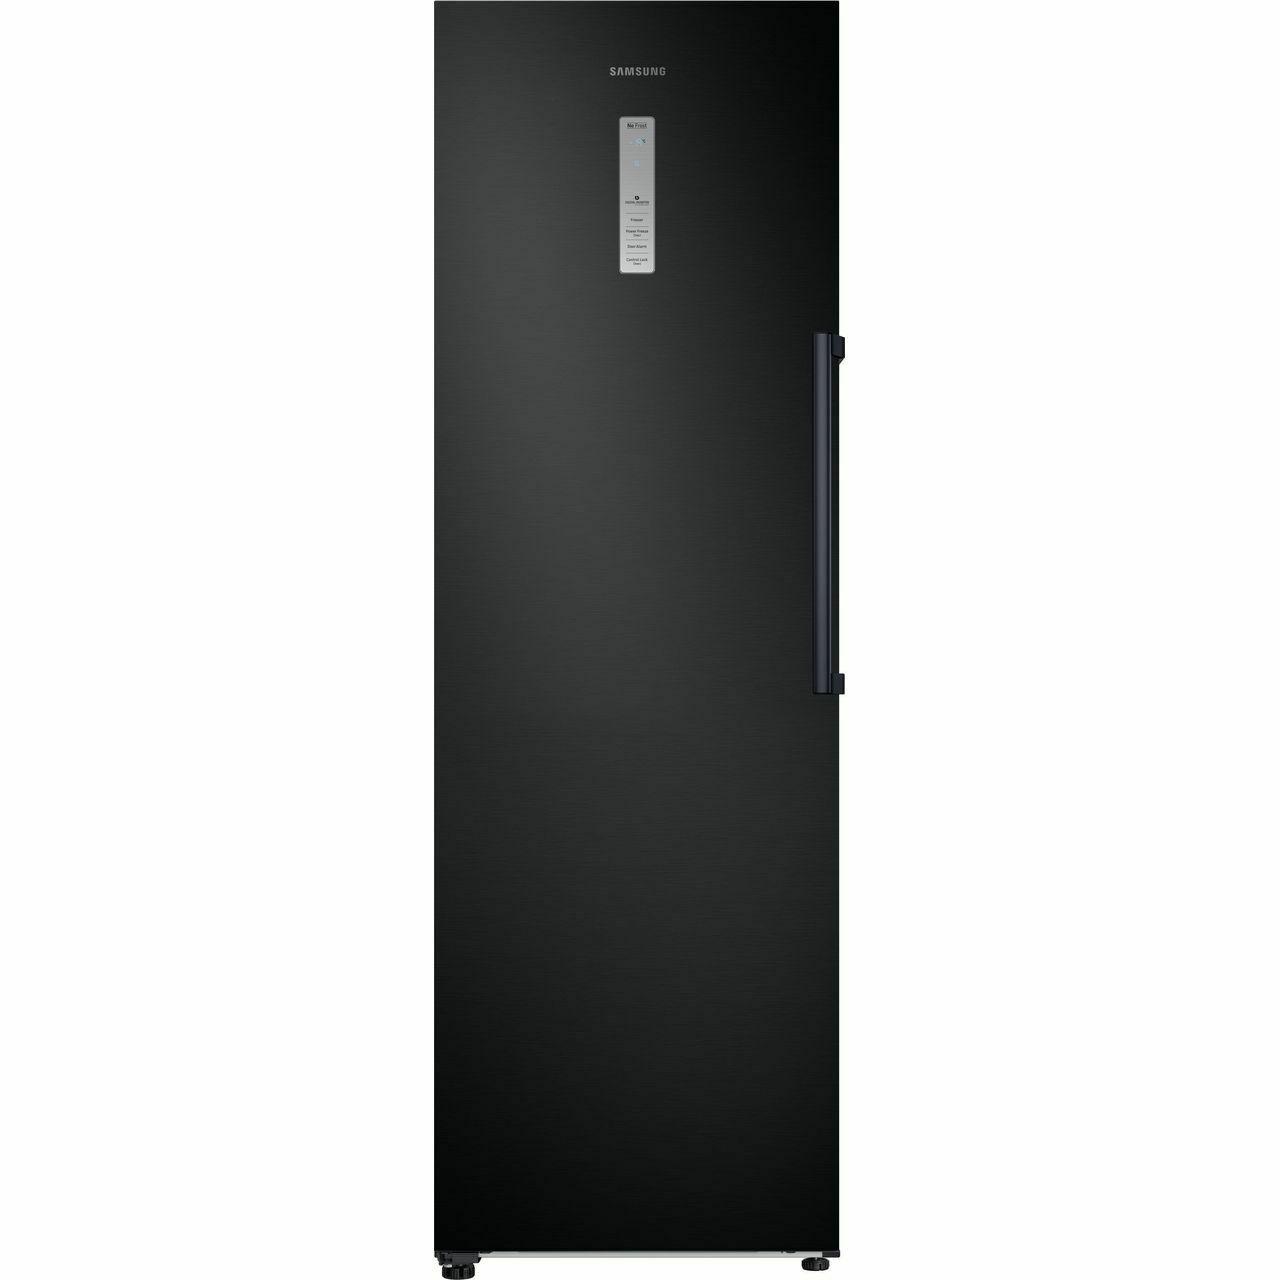 Image of Samsung RZ32M7125BN Tall Freezer W/ Four Drawers Frost Free + Fast Freeze